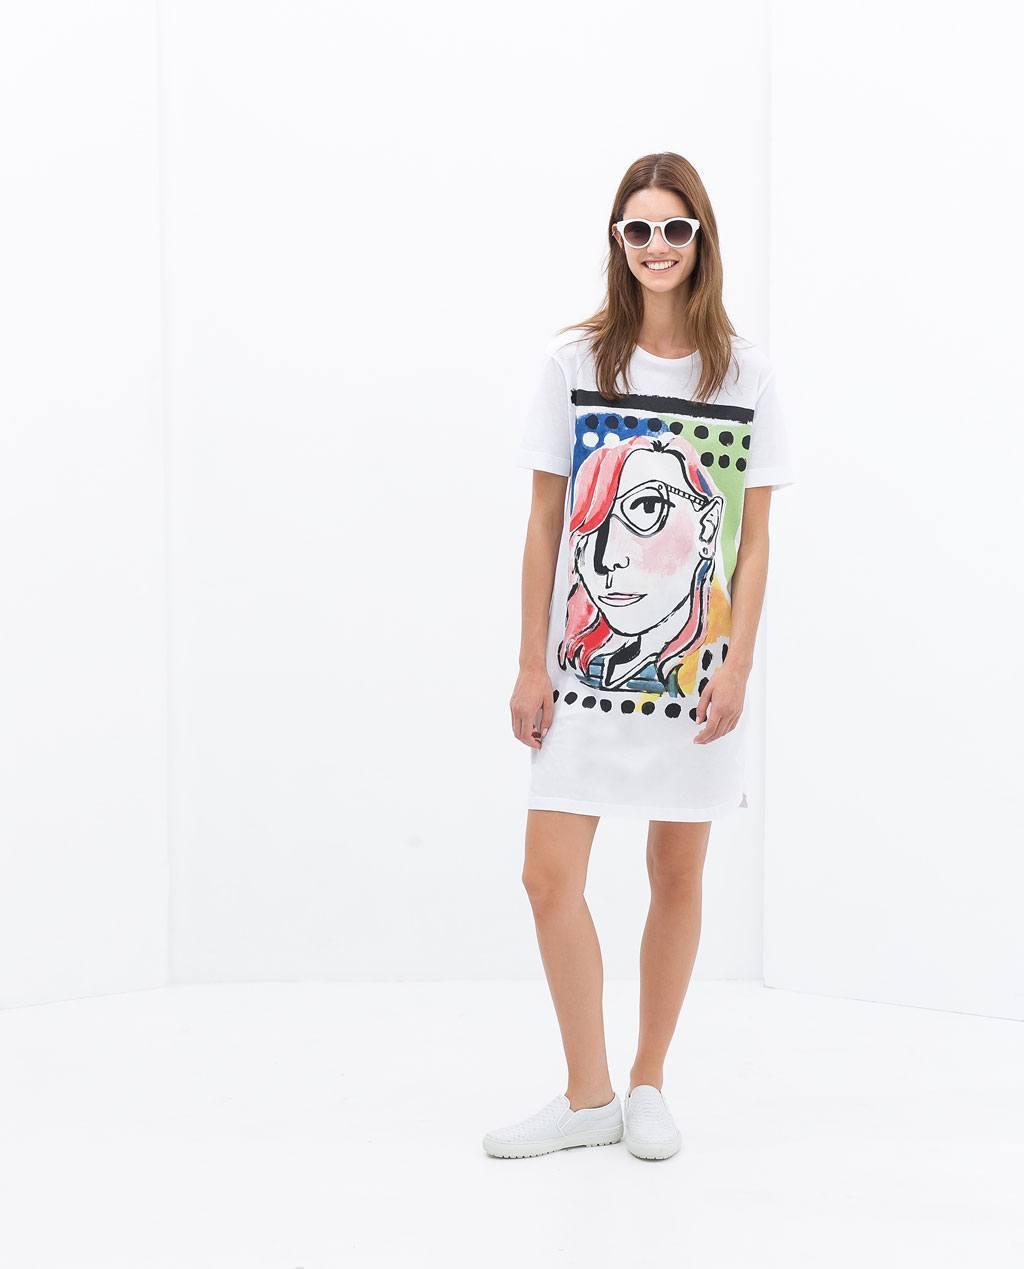 moda-para-adolescentes-verano-2014-vestido-camiseta-de-zara